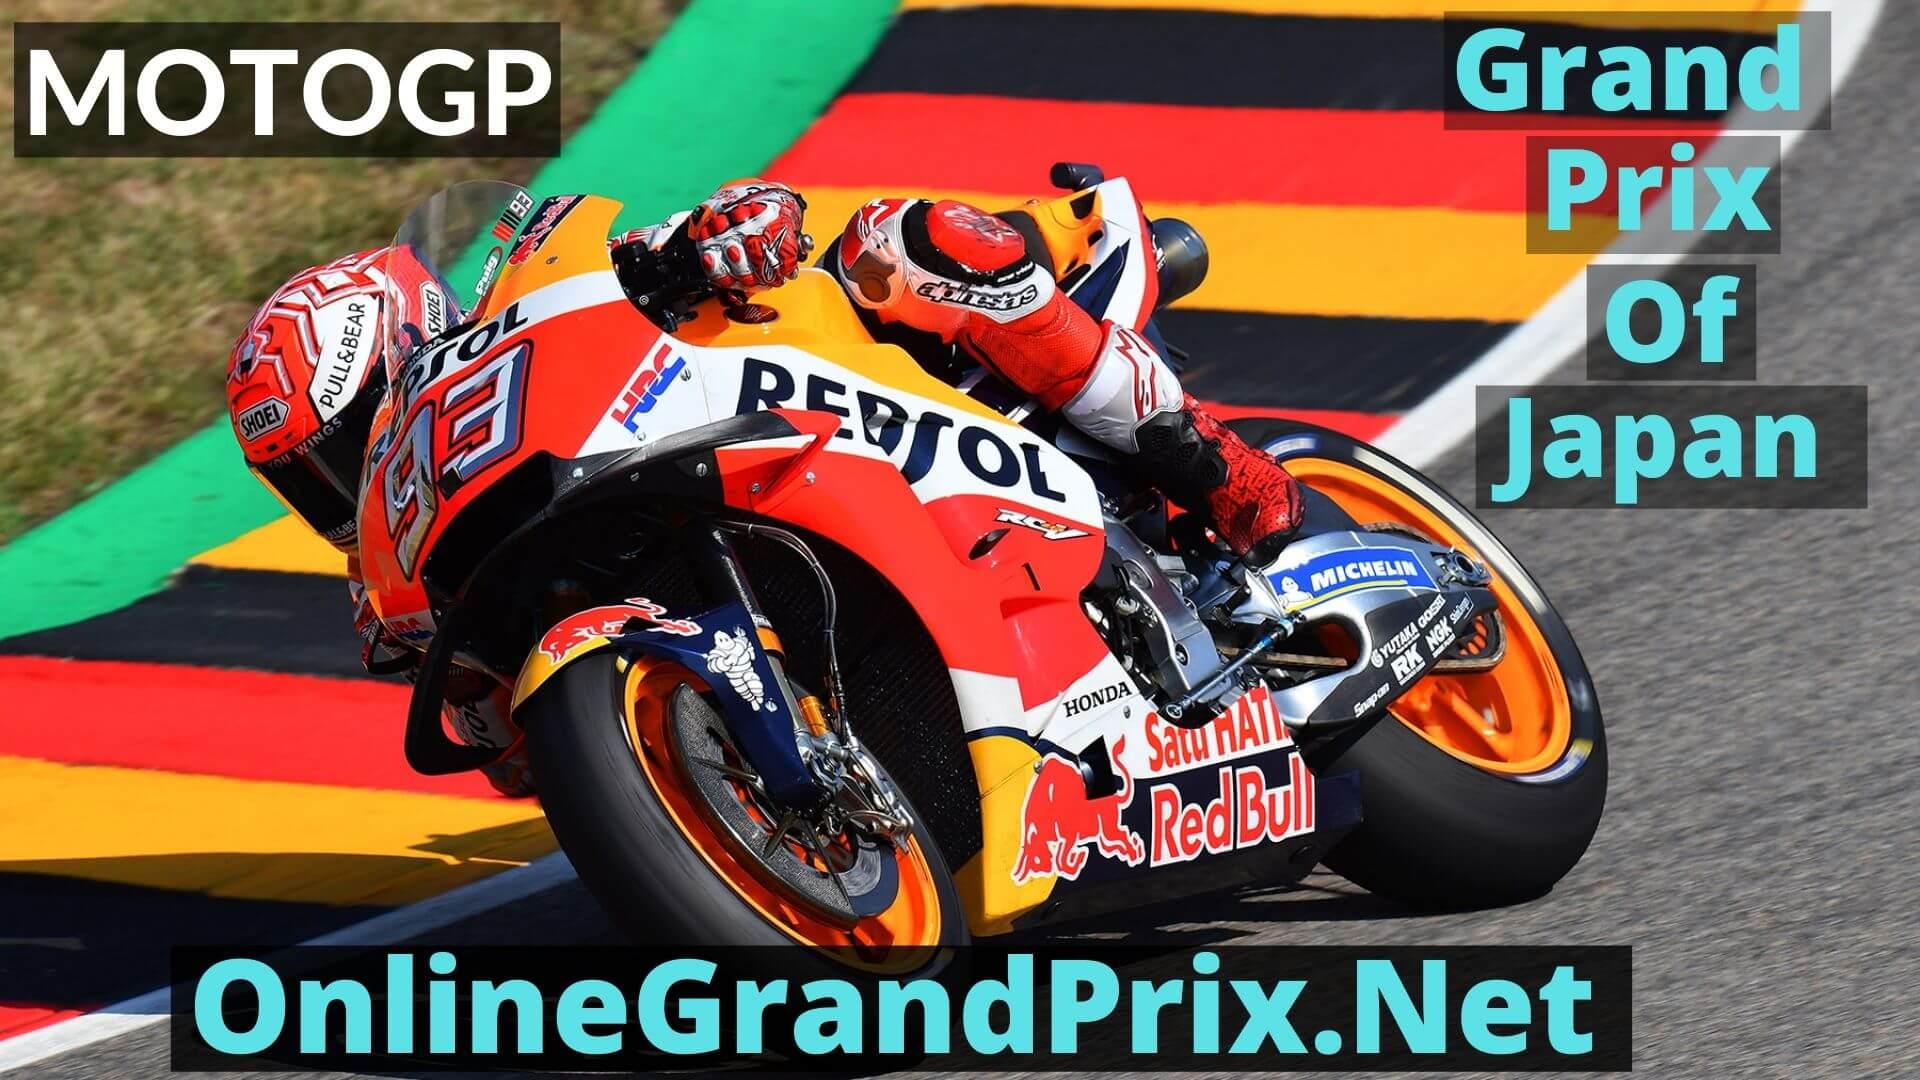 Grand Prix of Japan Live Stream 2020 | MotoGP